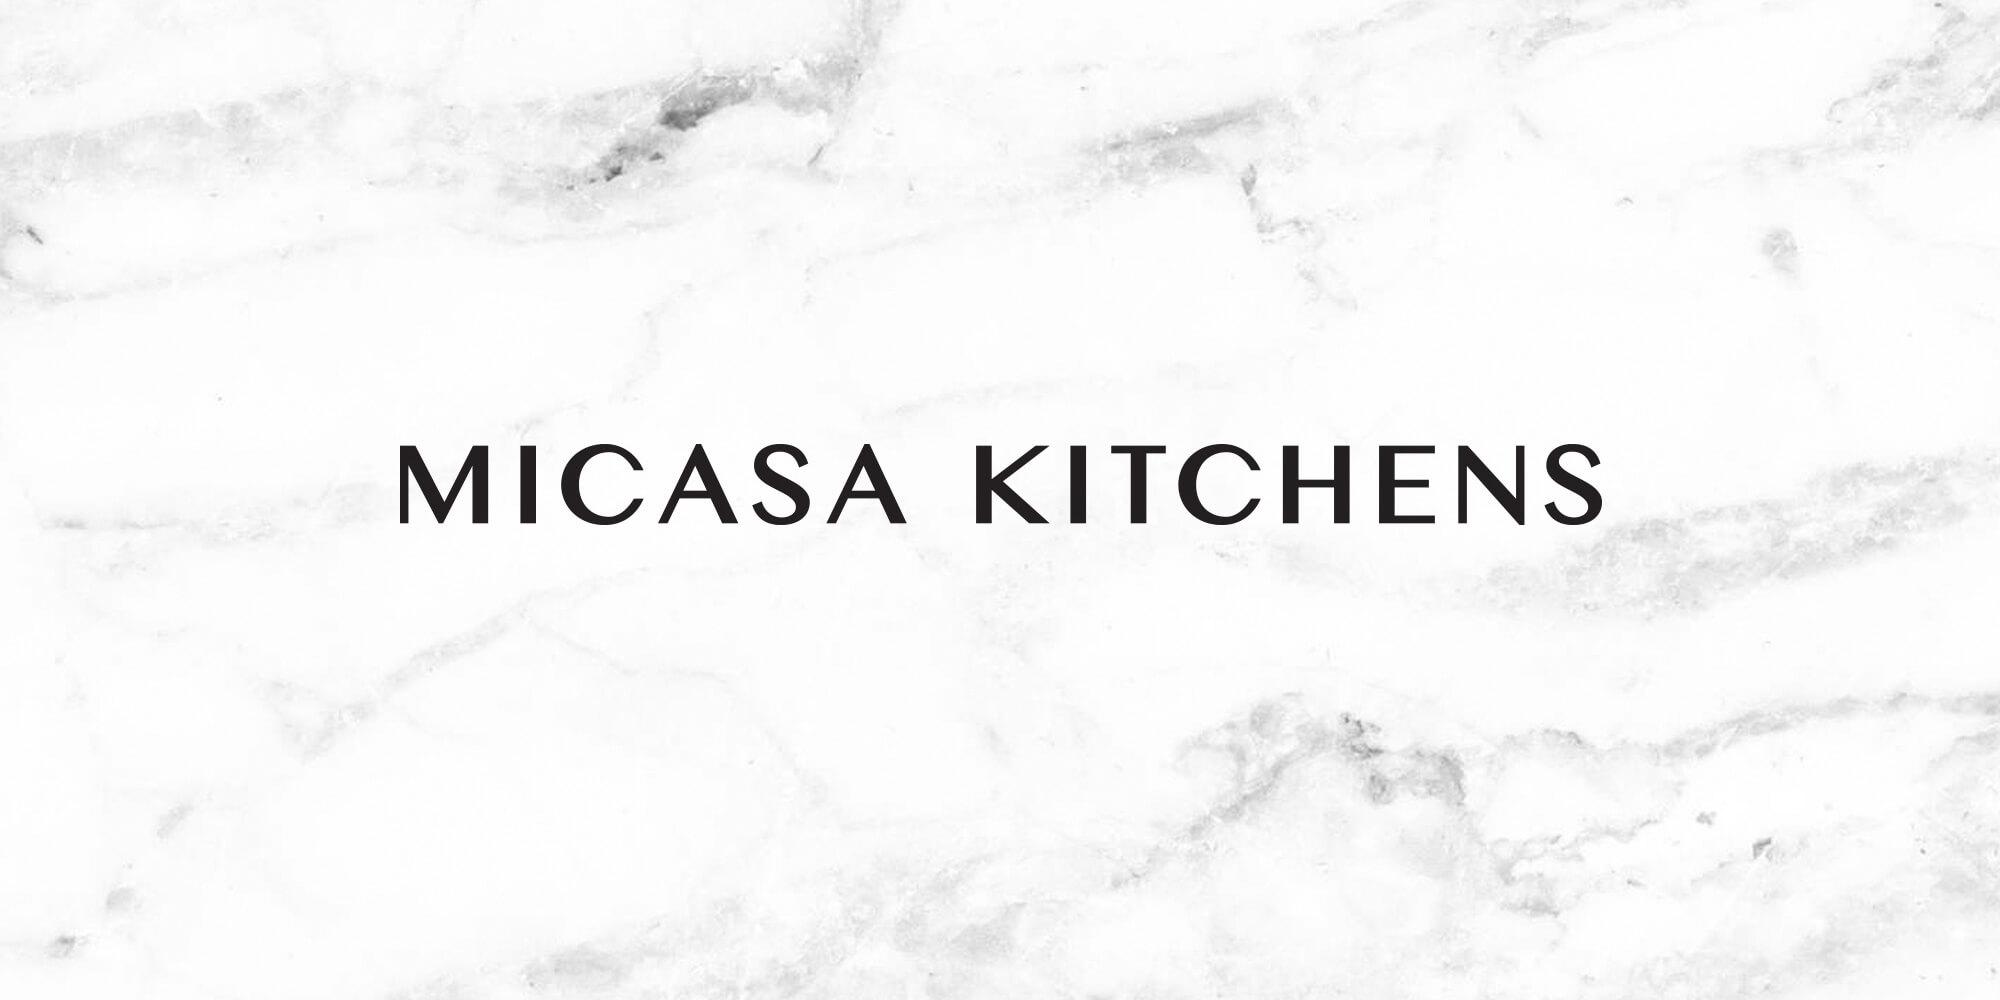 Micasa-identity-2